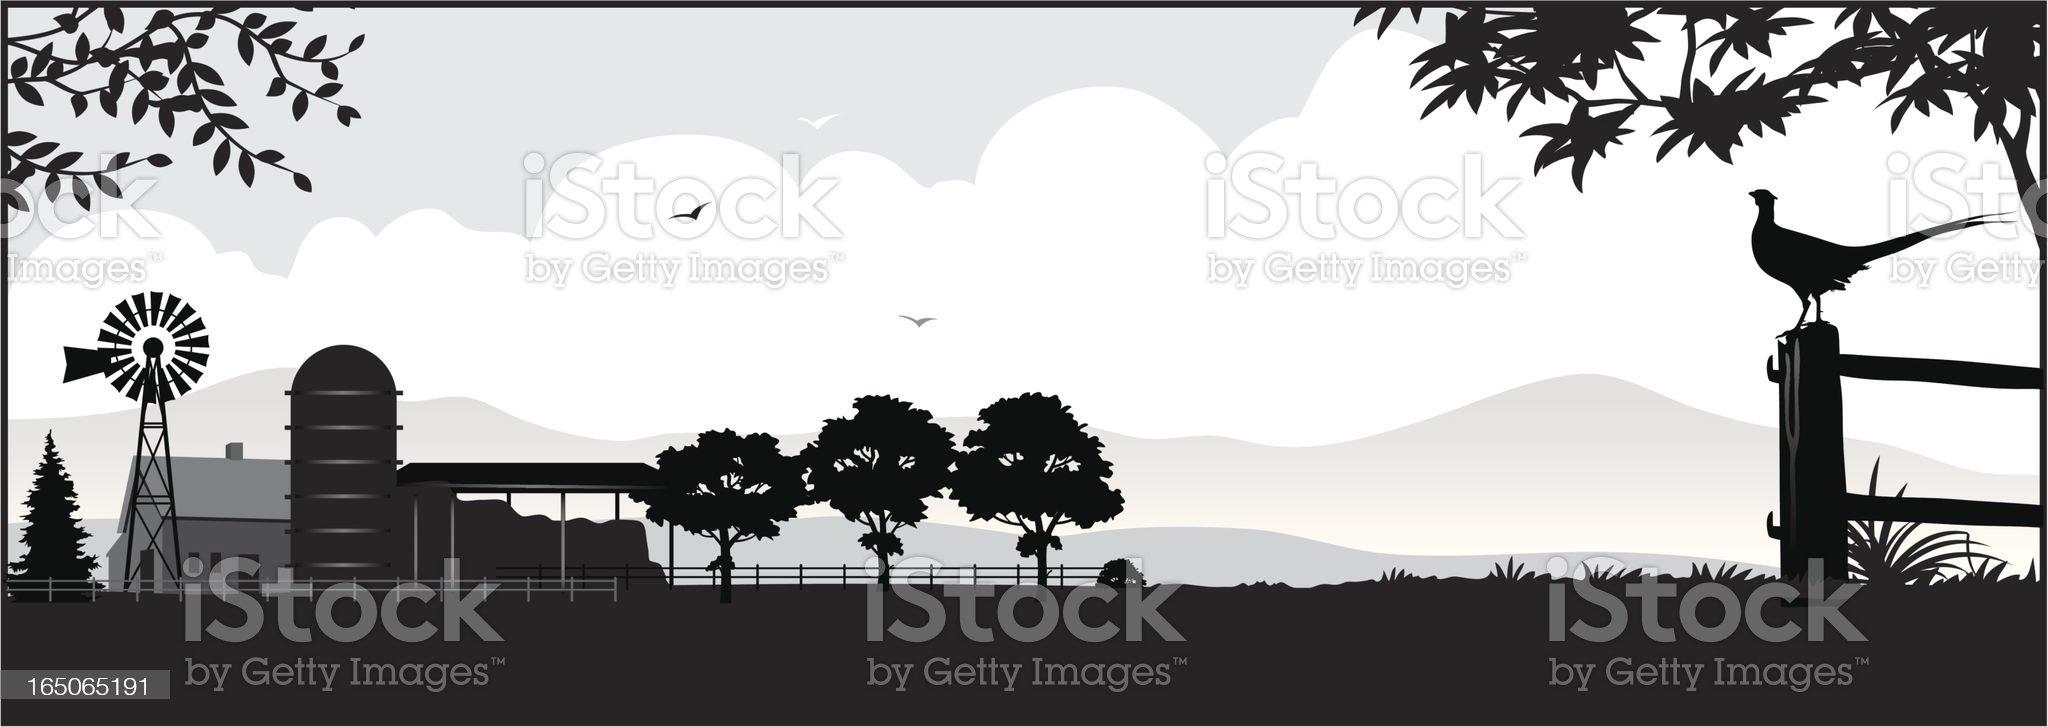 Farm silhouette royalty-free stock vector art